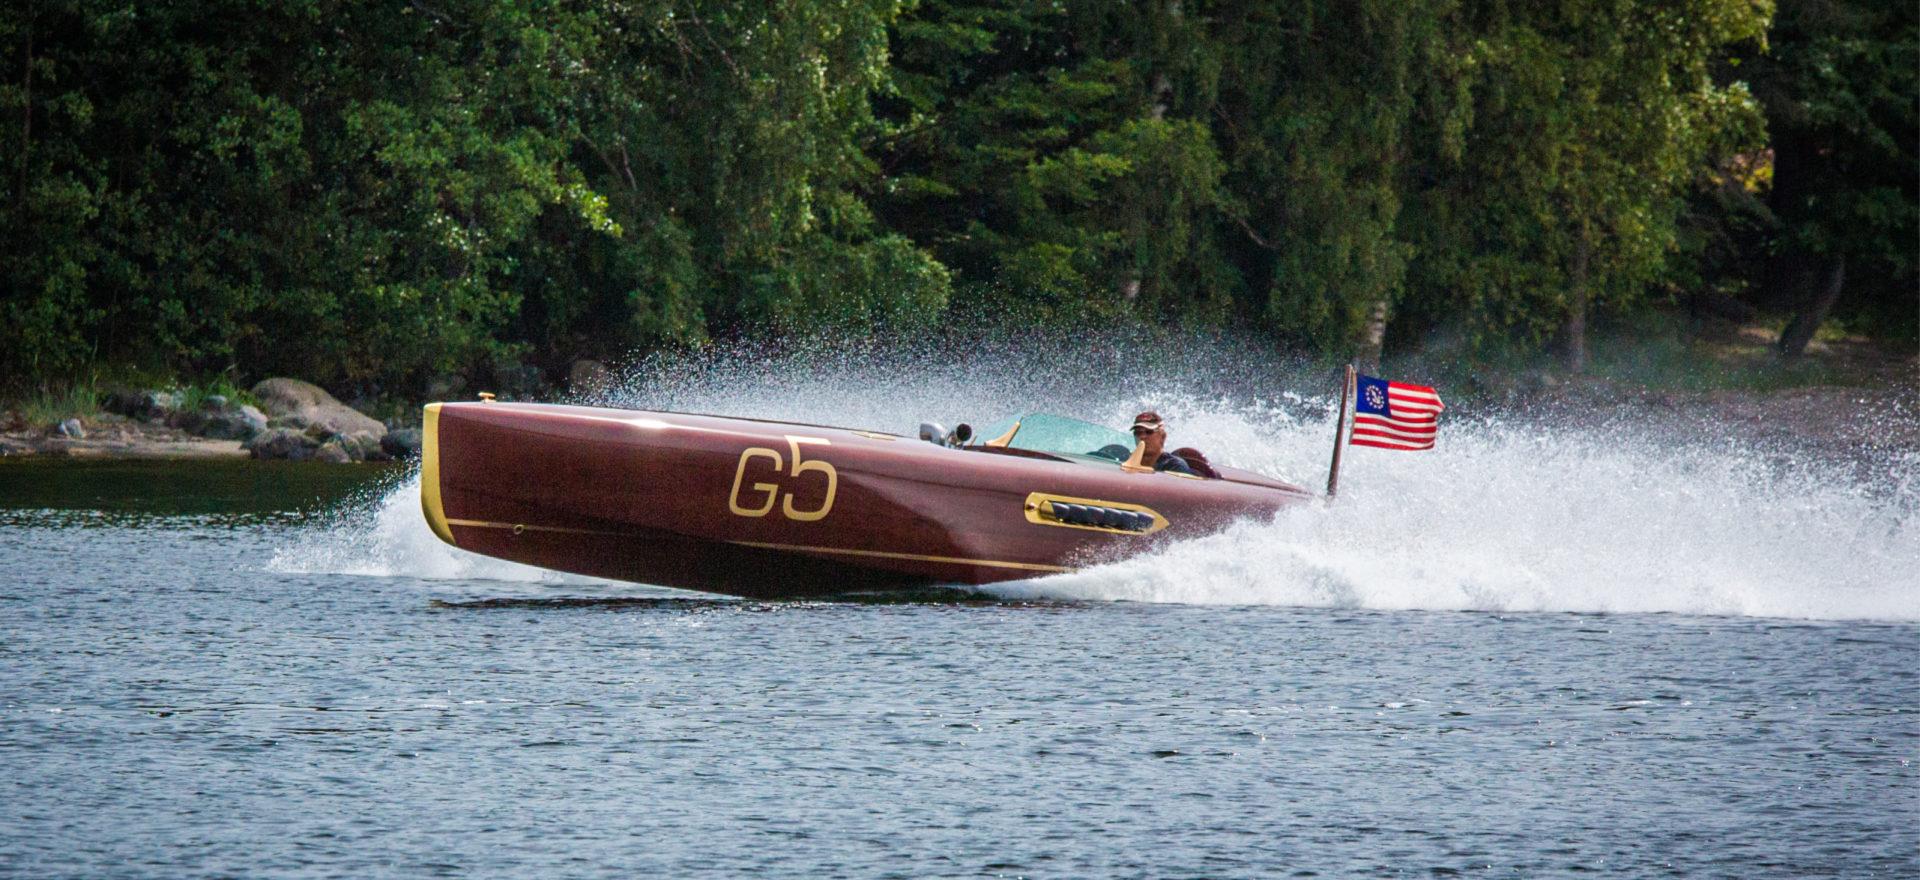 G5 boat_PRINT-7365